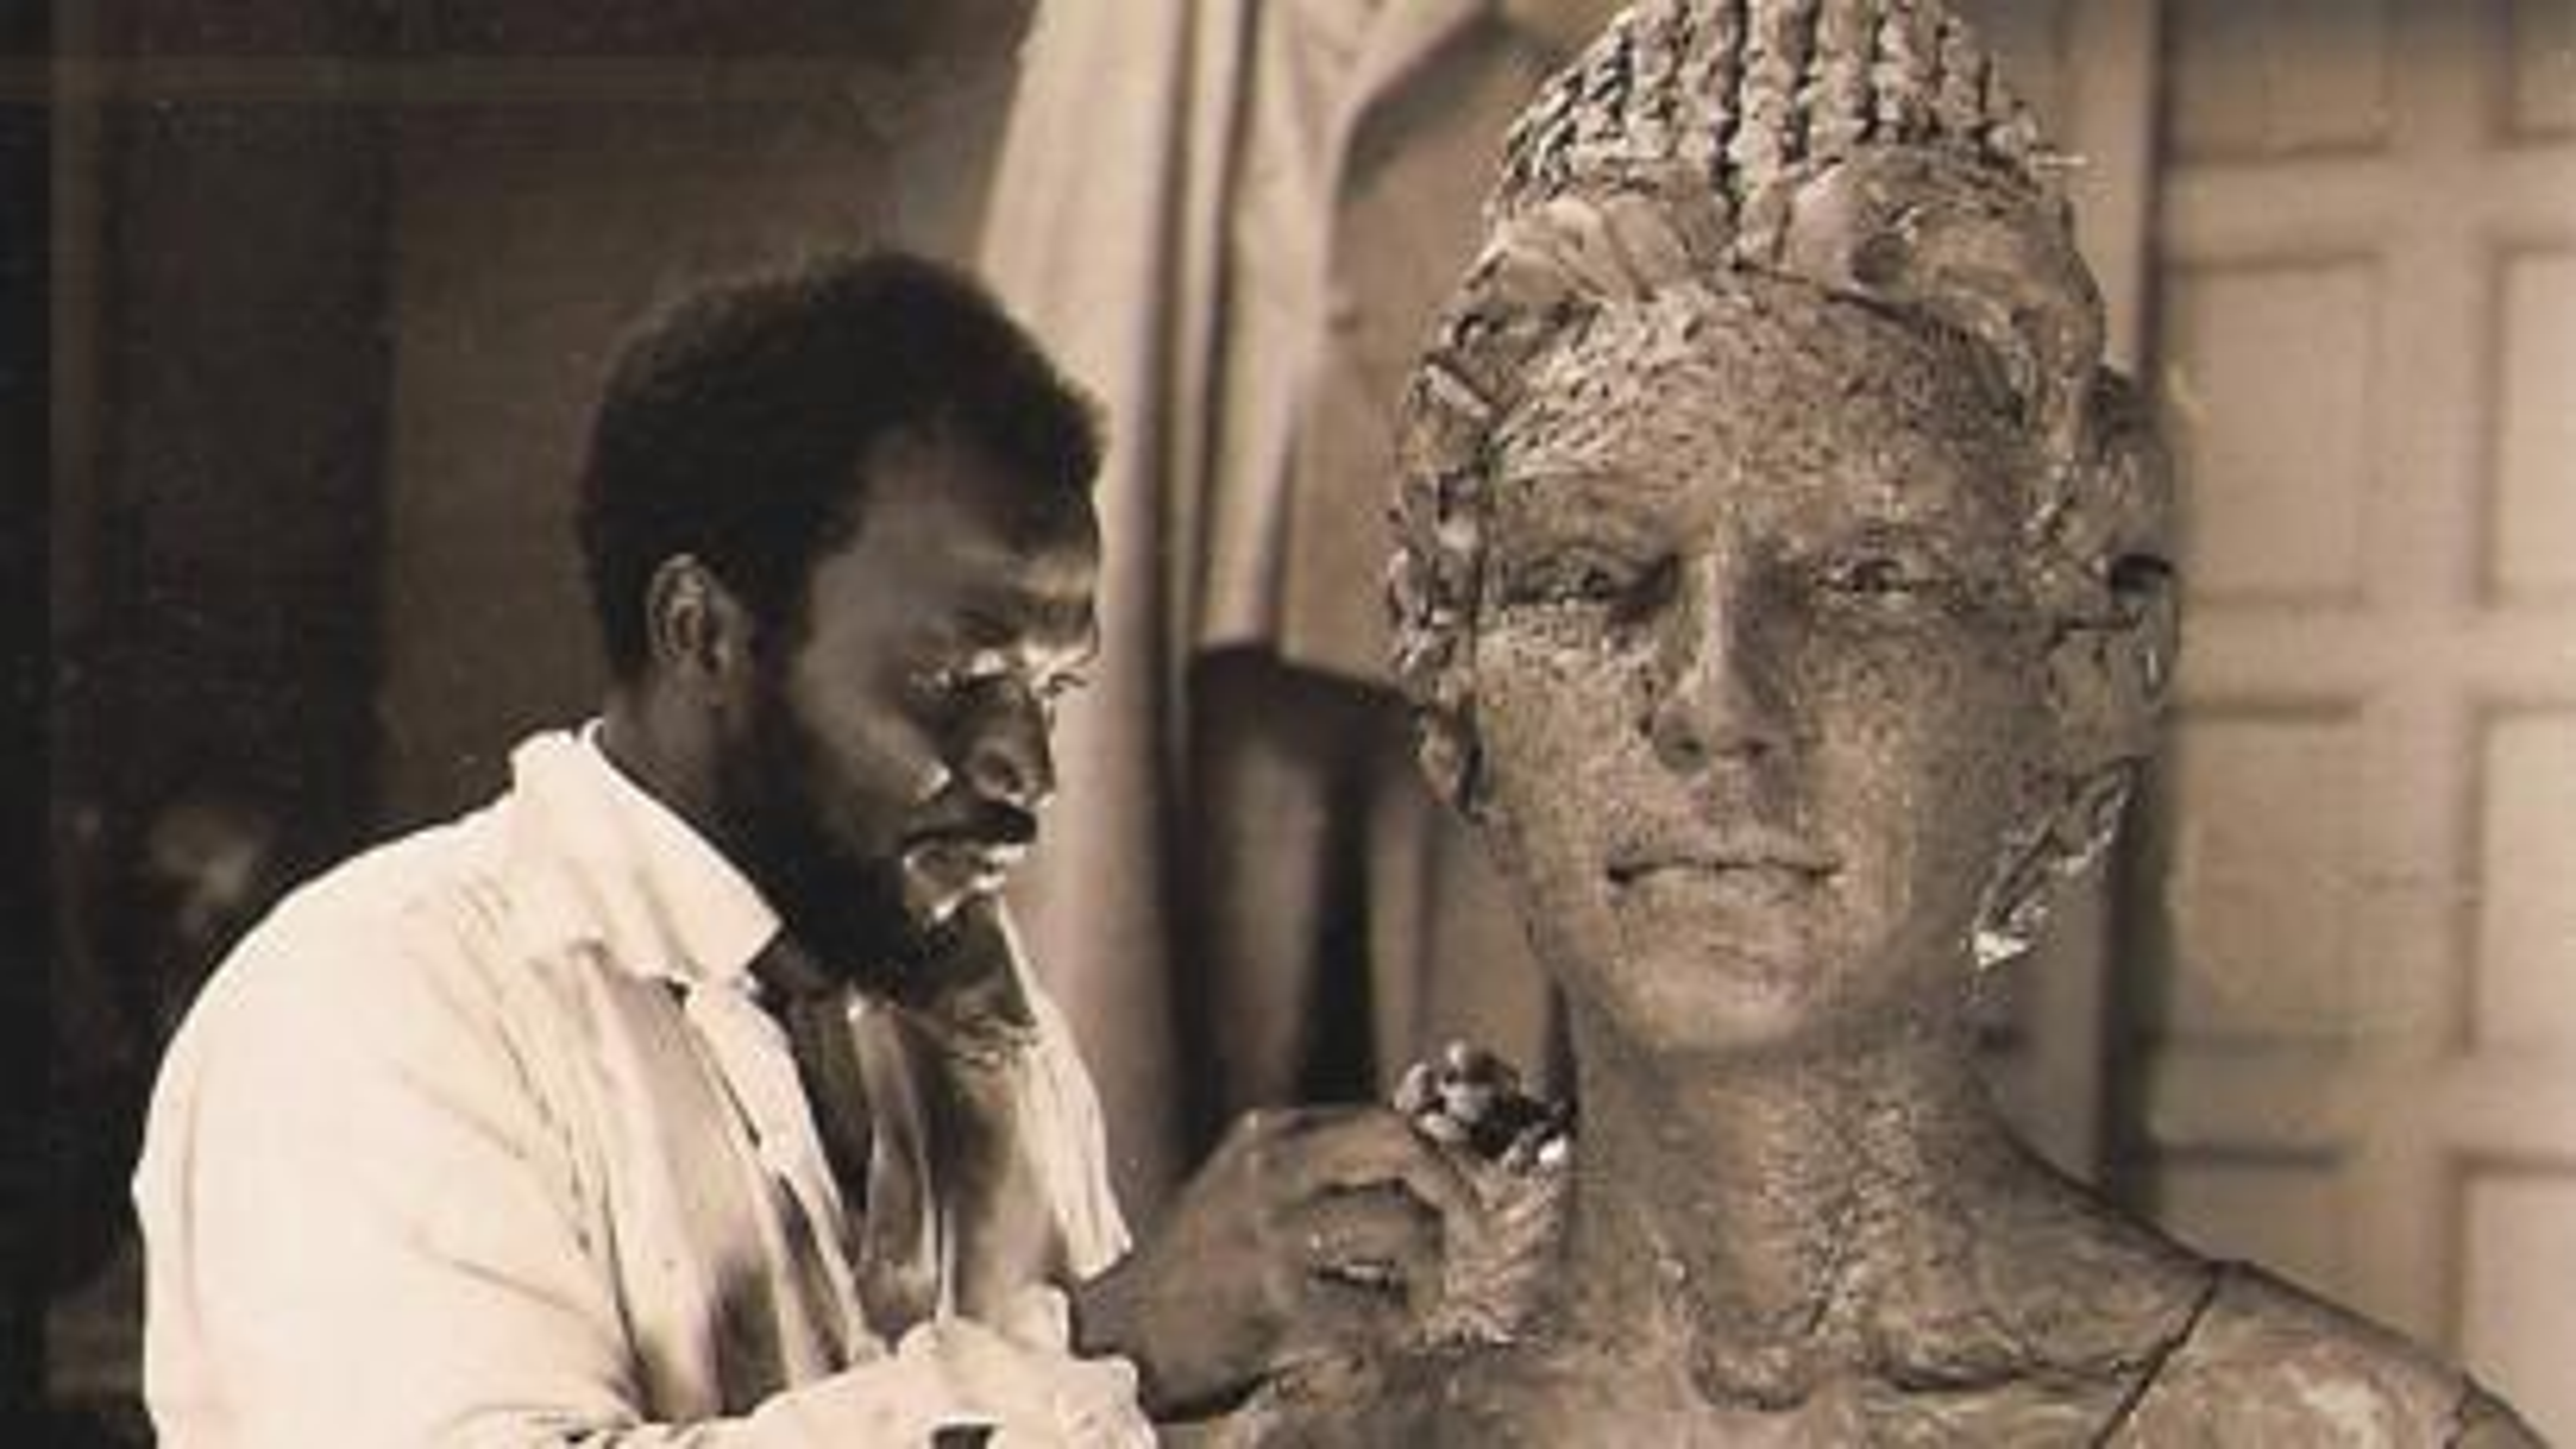 Archival picture of Ben Enwonwu in the studio of Sir William Reid- Dick, working on bronze portrait of Queen Elizabeth II. Courtesy of The Ben Enwonwu Foundation